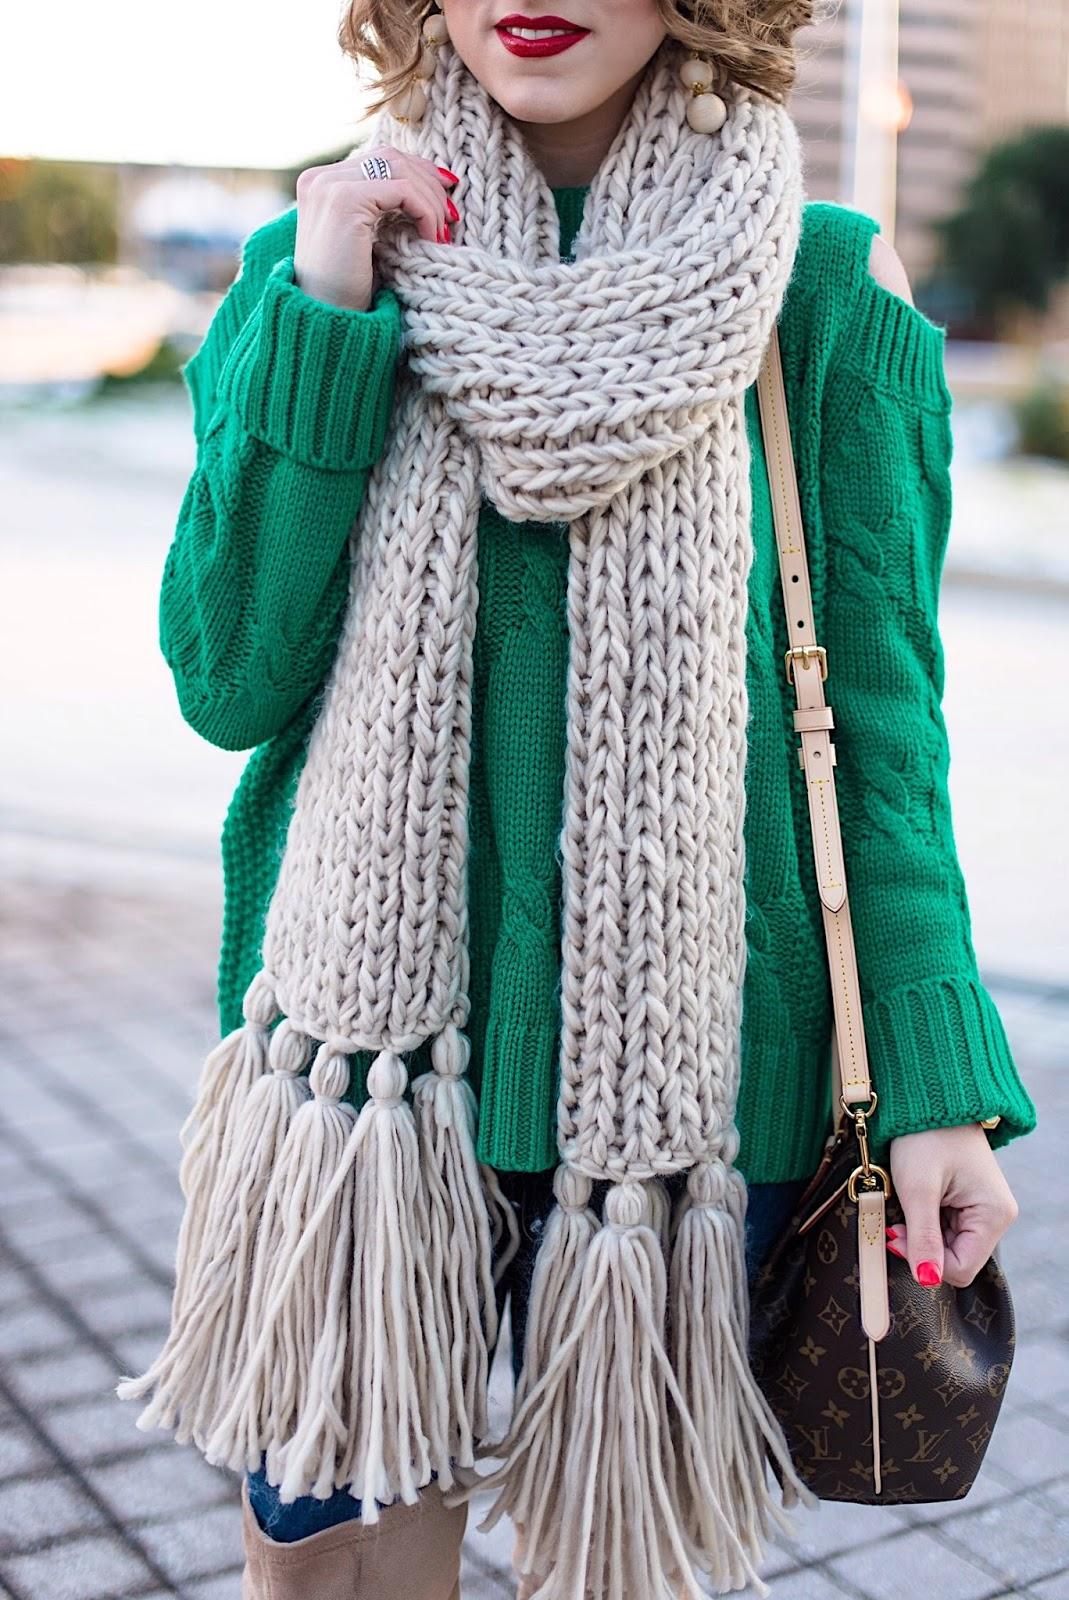 Winter Fashion: Chunky Knit Scarf - Something Delightful Blog